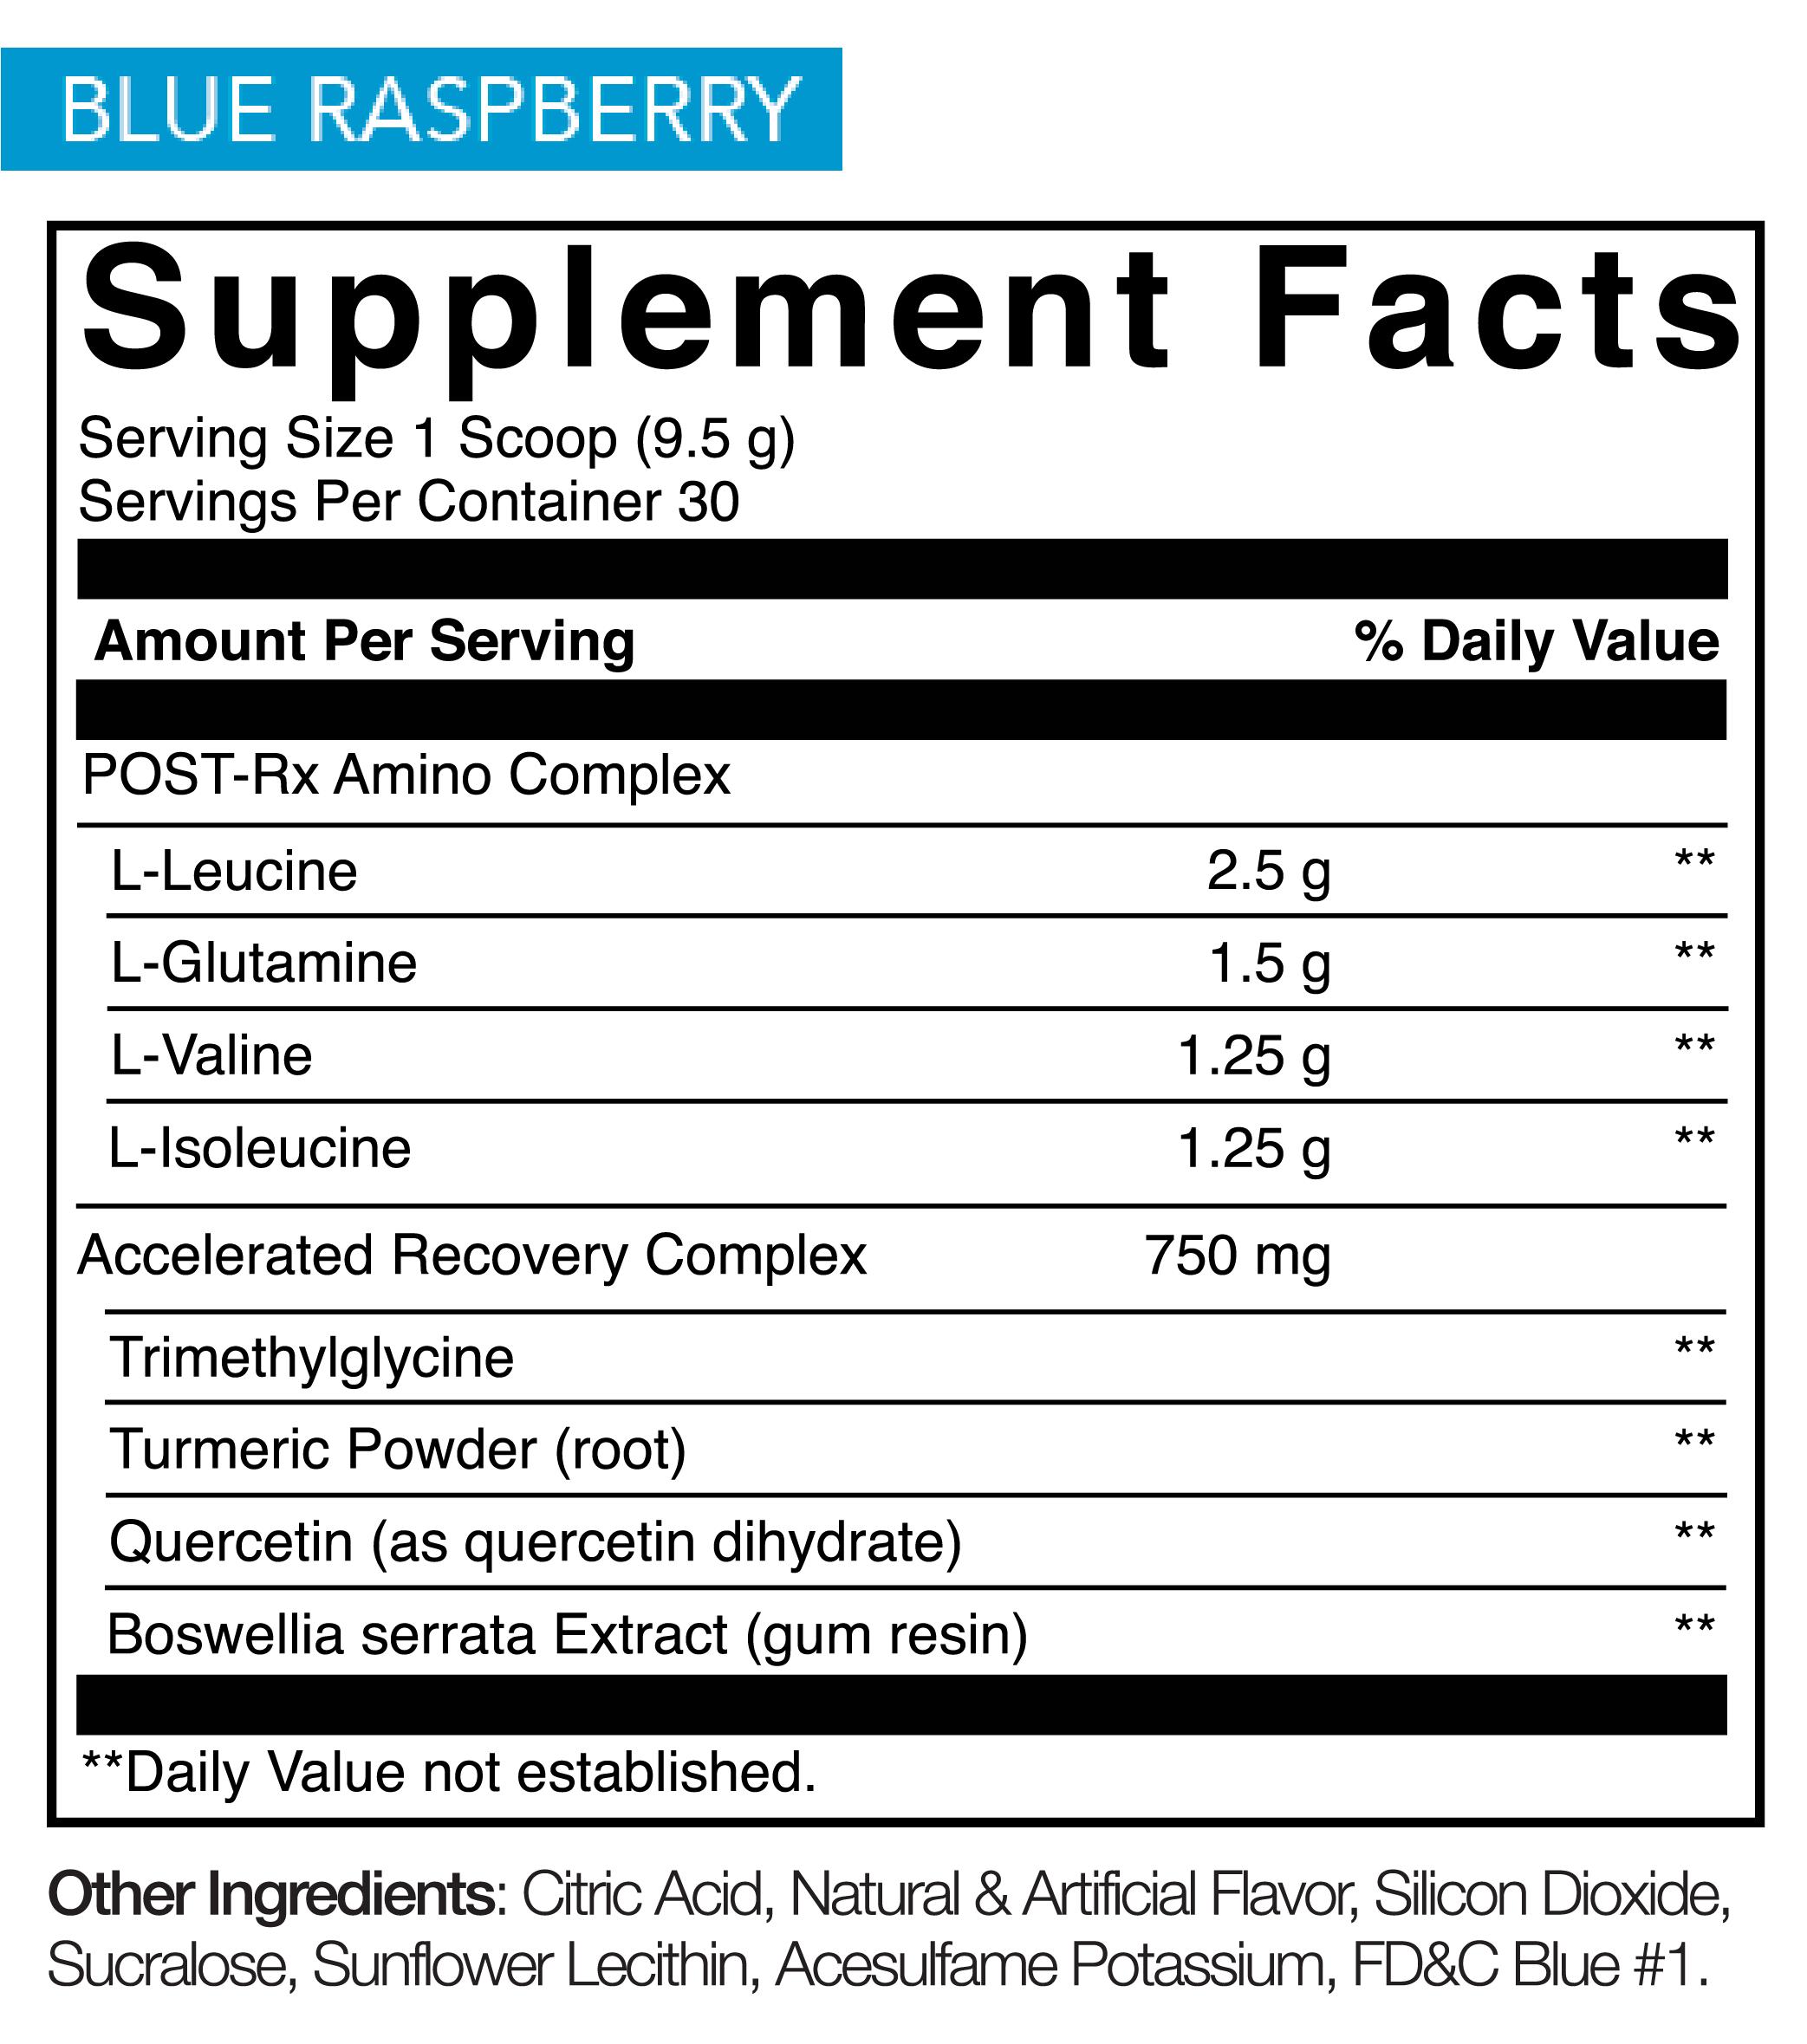 Blue Raspberry Nutrition